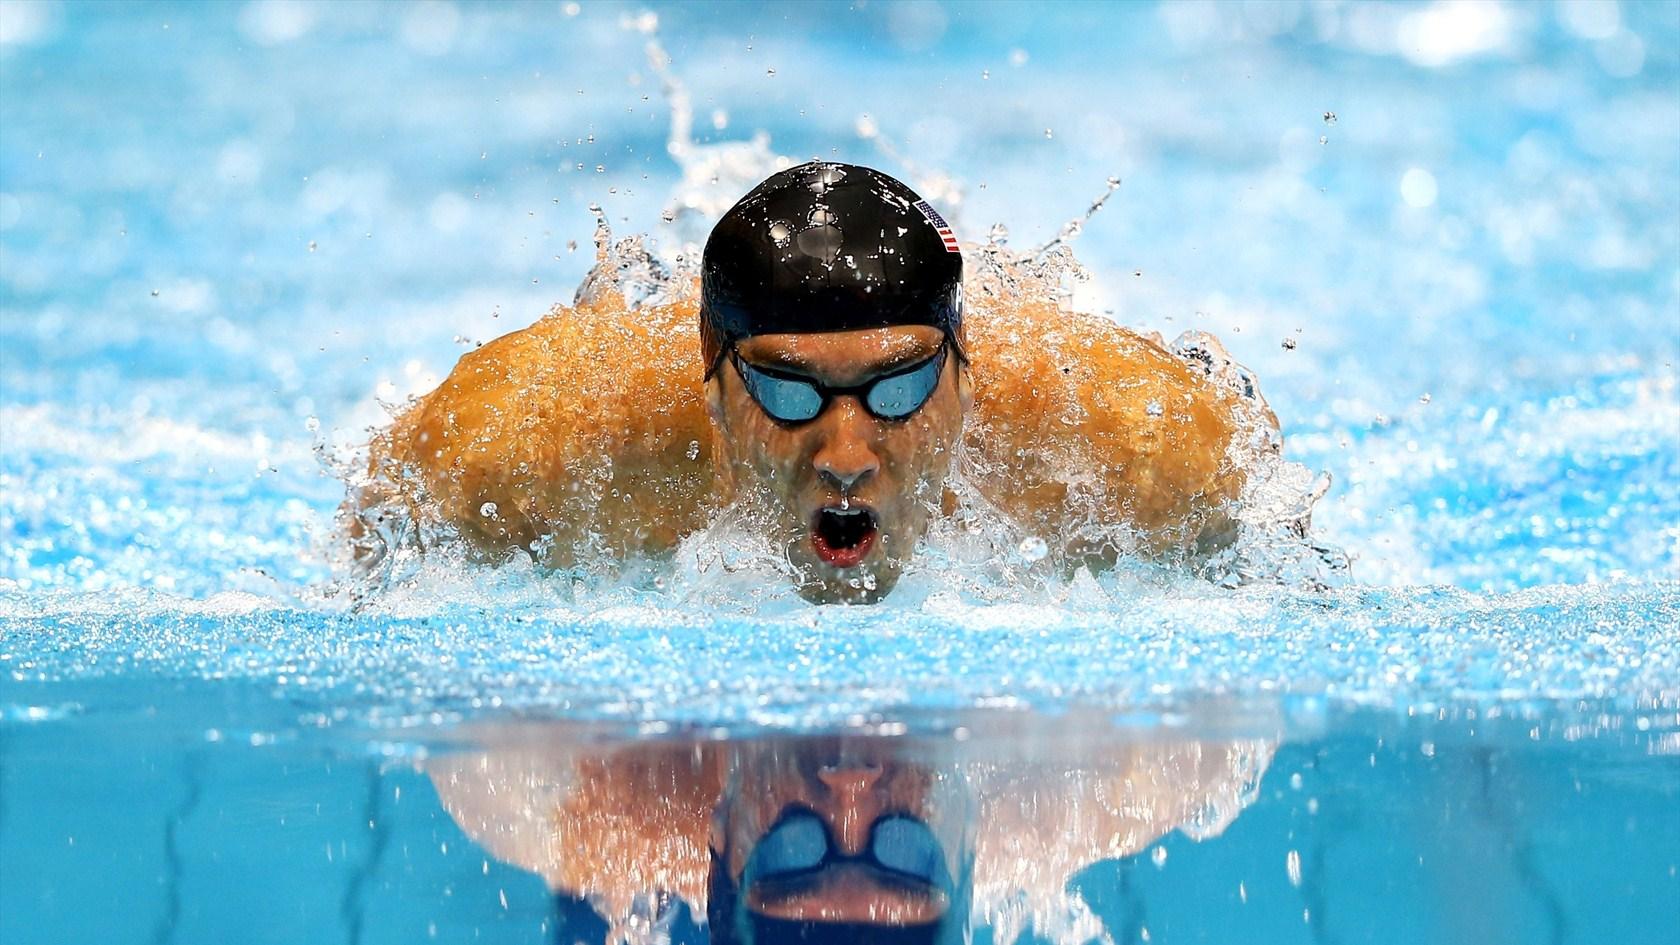 44 Hd Swimming Wallpaper On Wallpapersafari